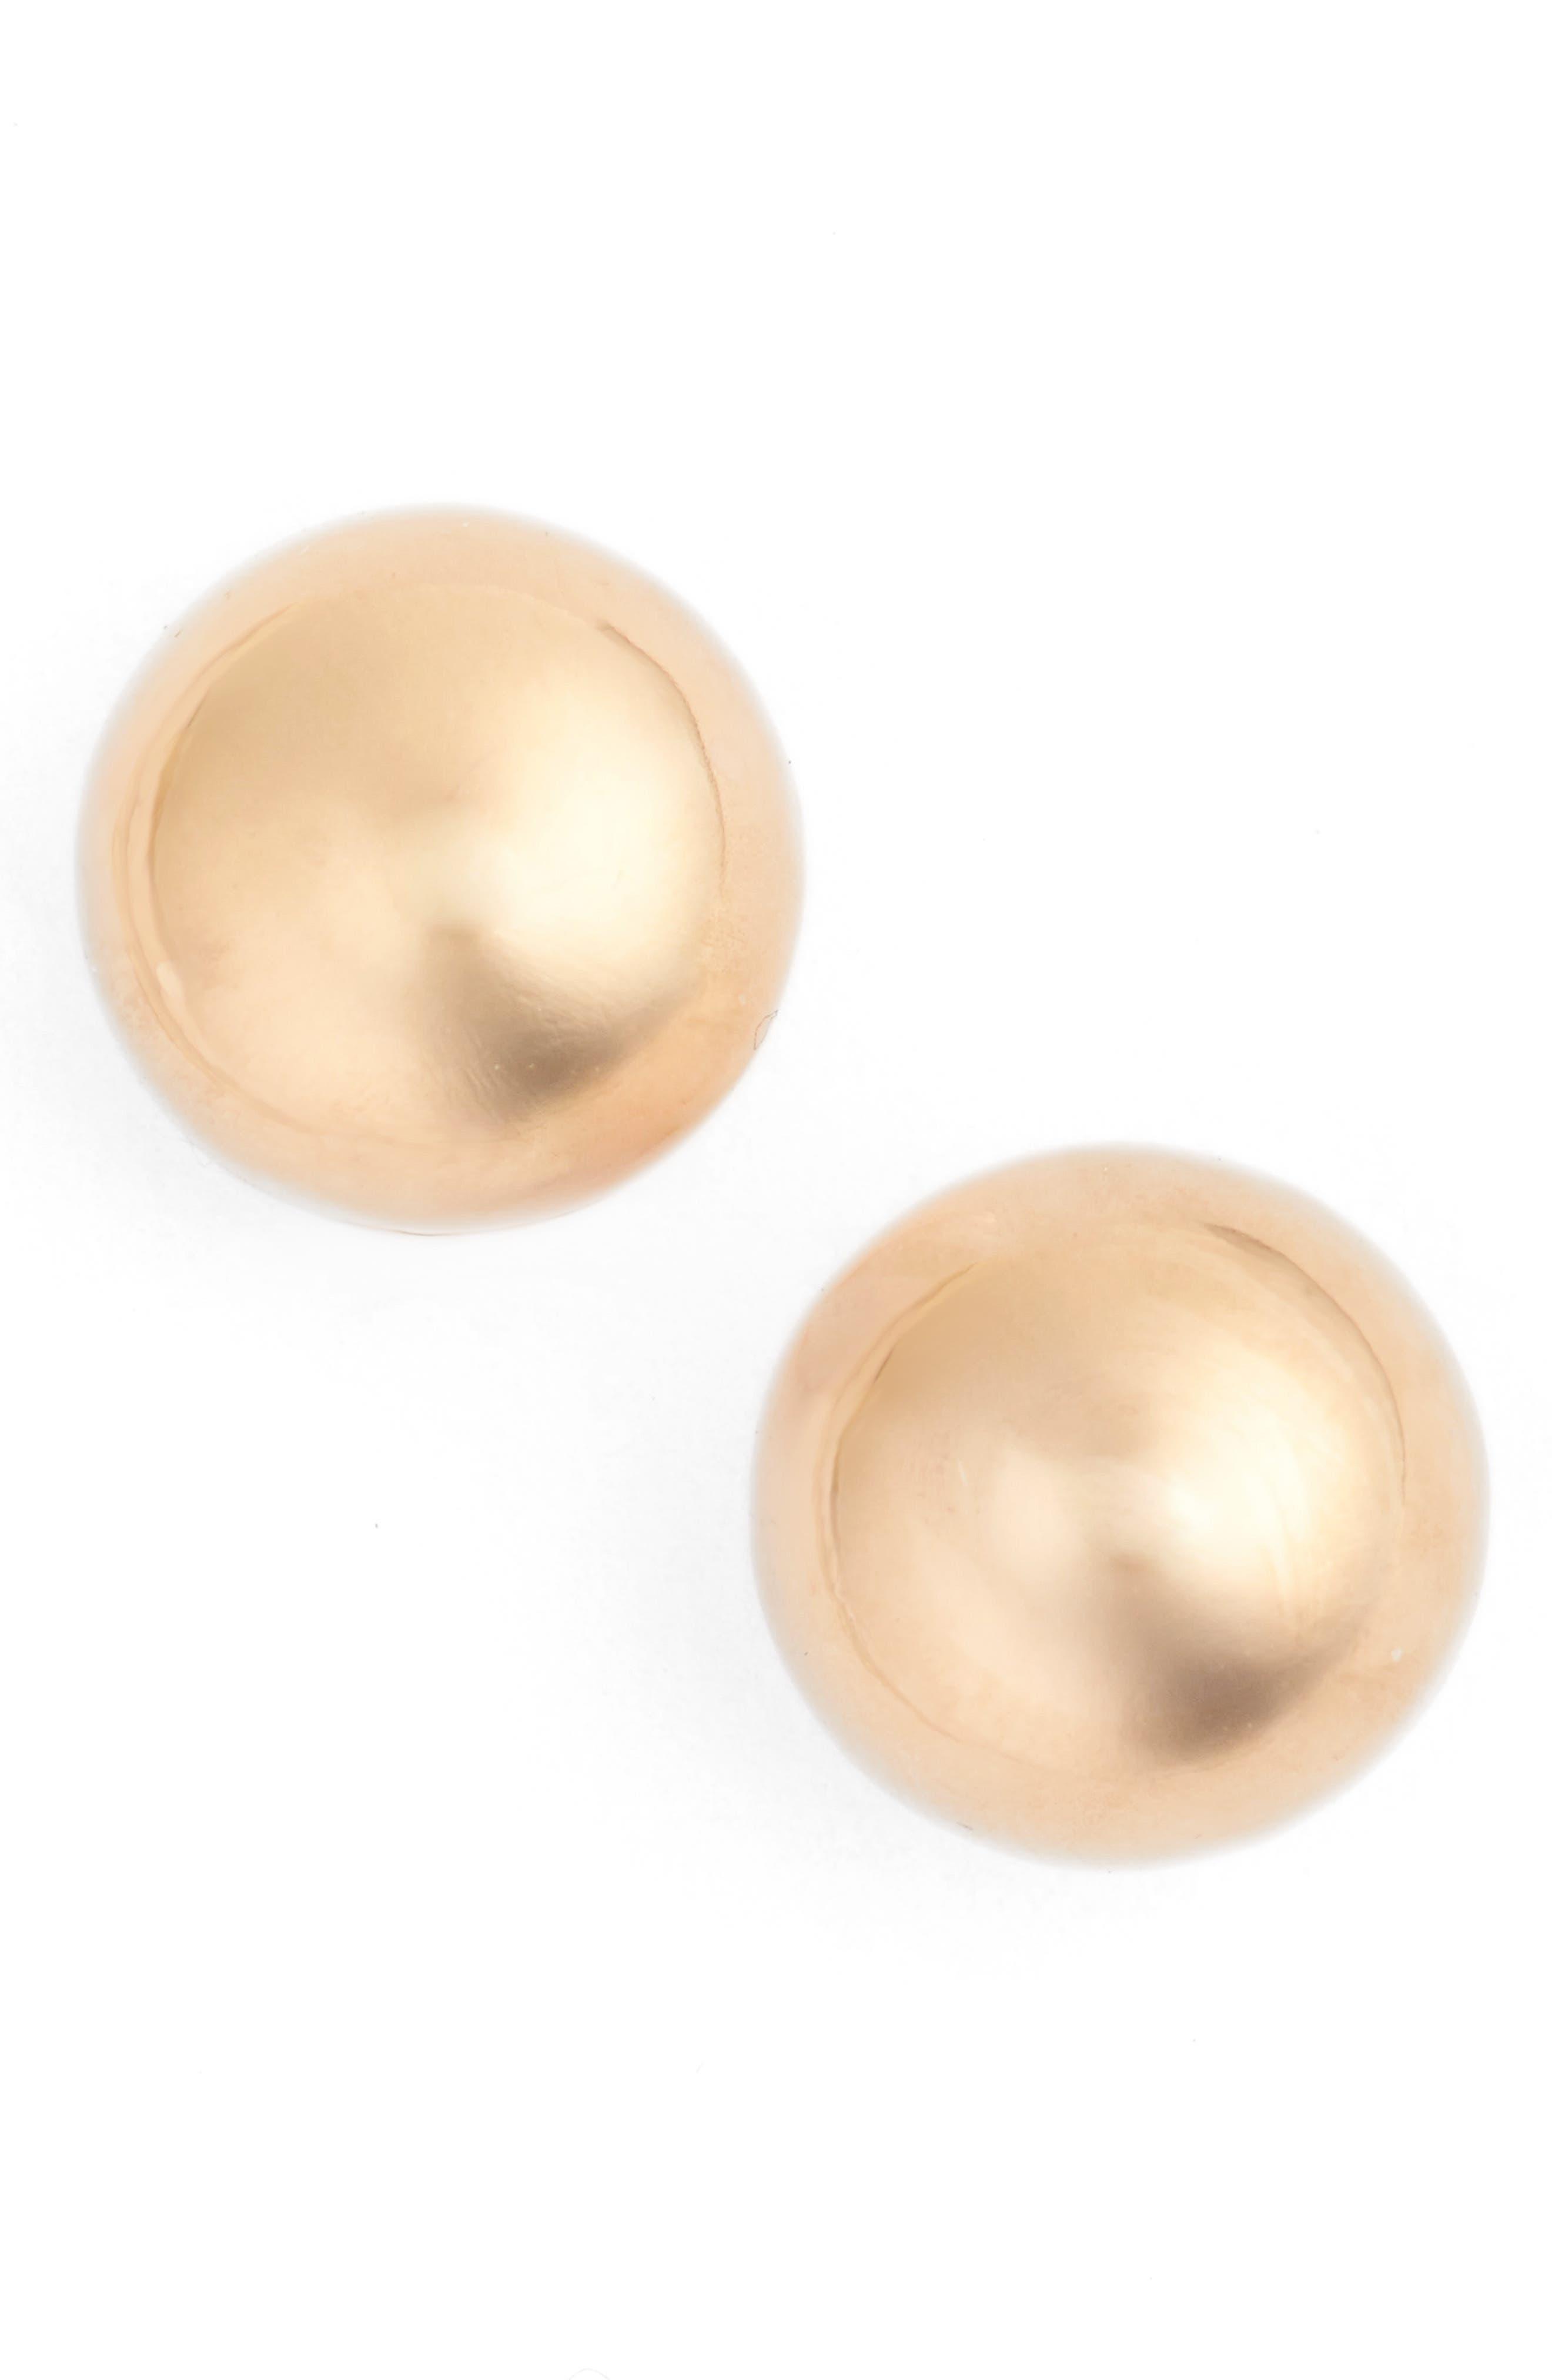 Ball Stud Earrings,                             Main thumbnail 1, color,                             Rose Gold